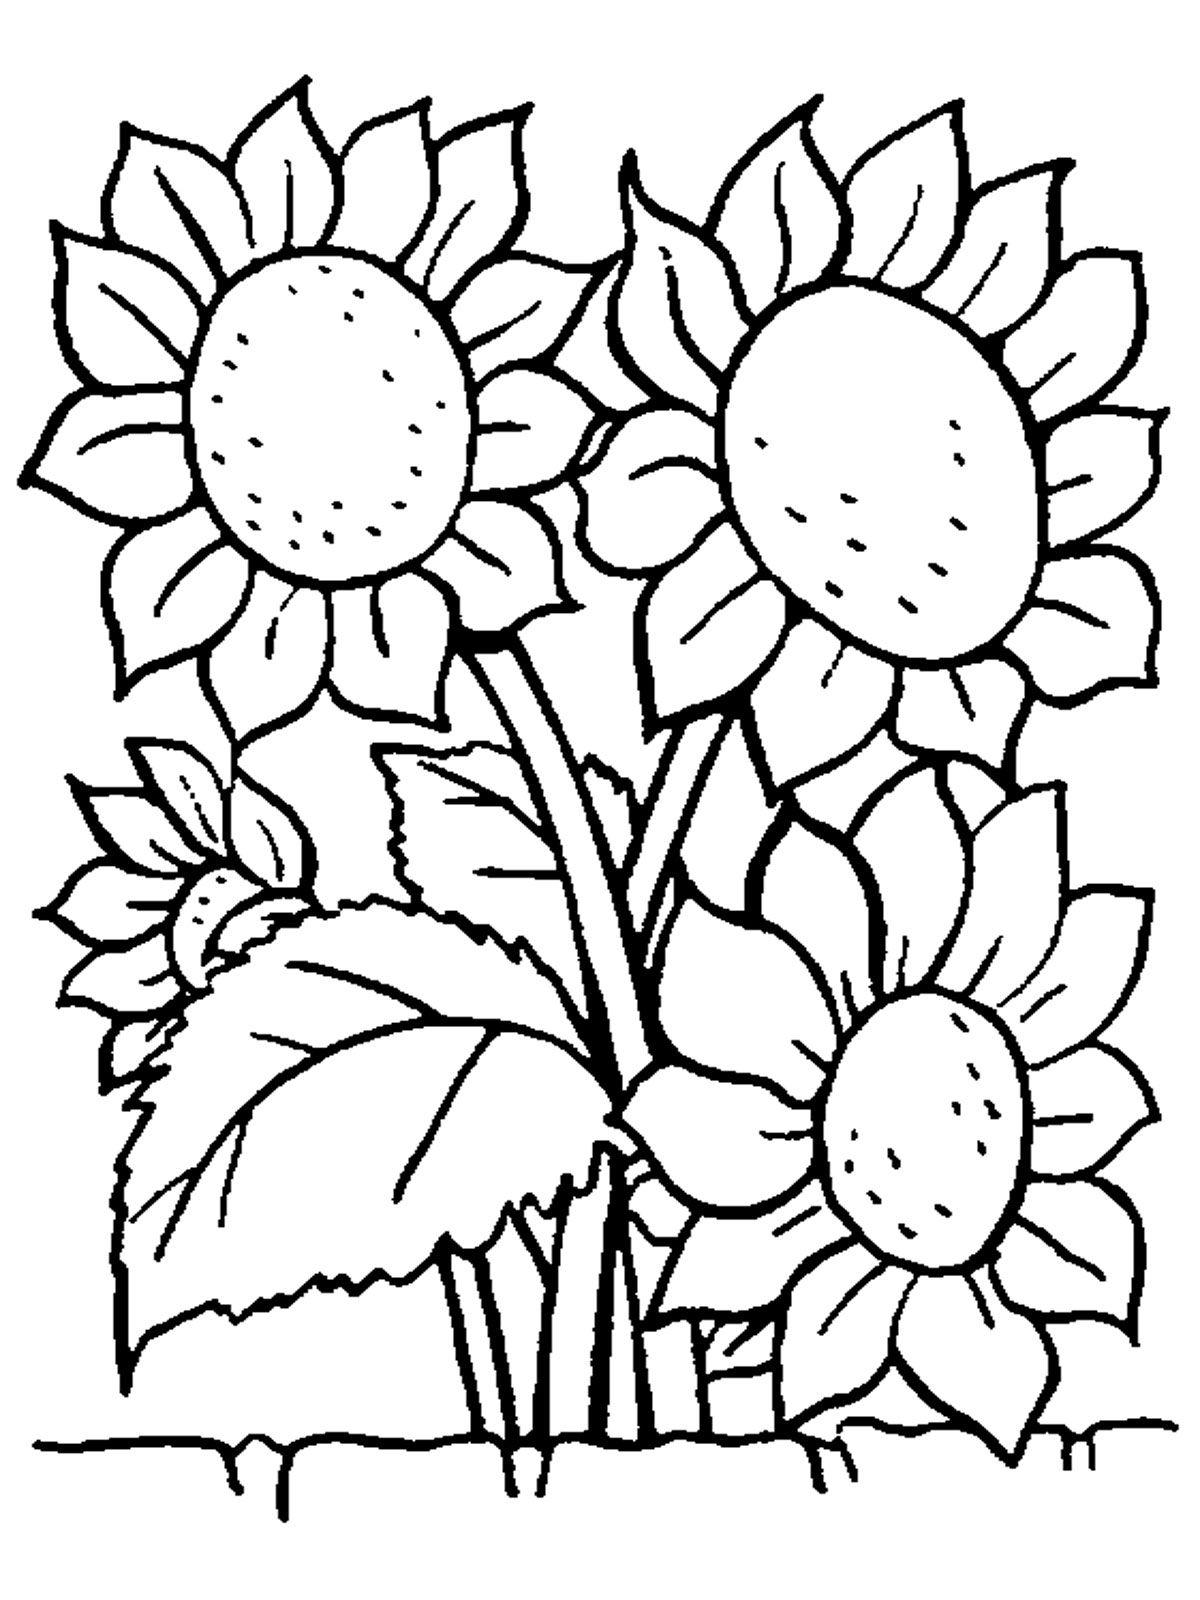 раскраска подсолнух, раскраска цветок | xinh xinh | Pinterest | Kreativ